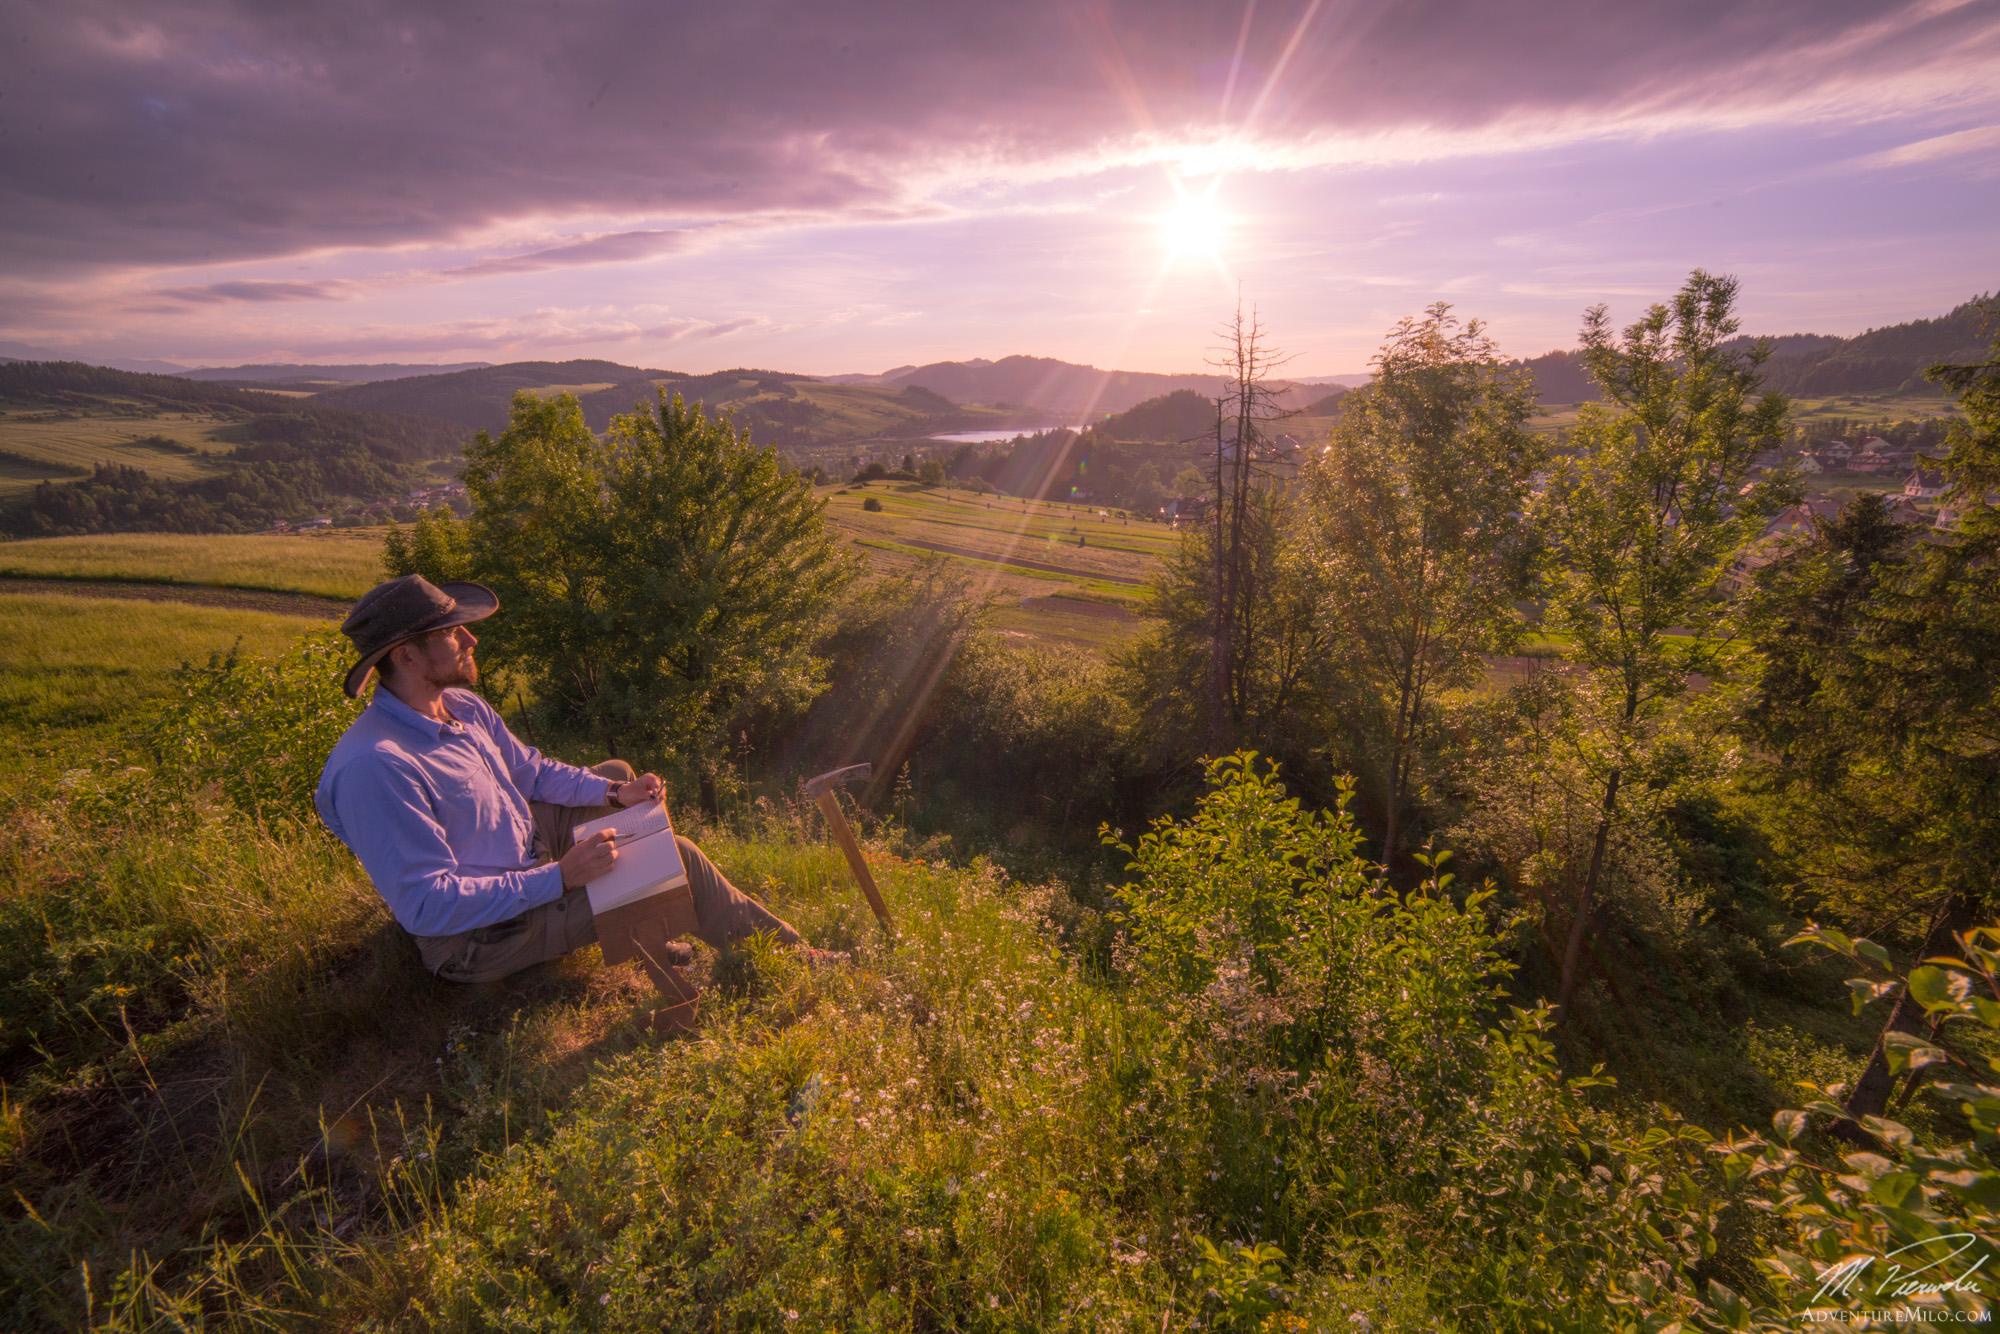 Camping In The Polish Mountains Adventuremilo # Banc Tv But Chene Naturel